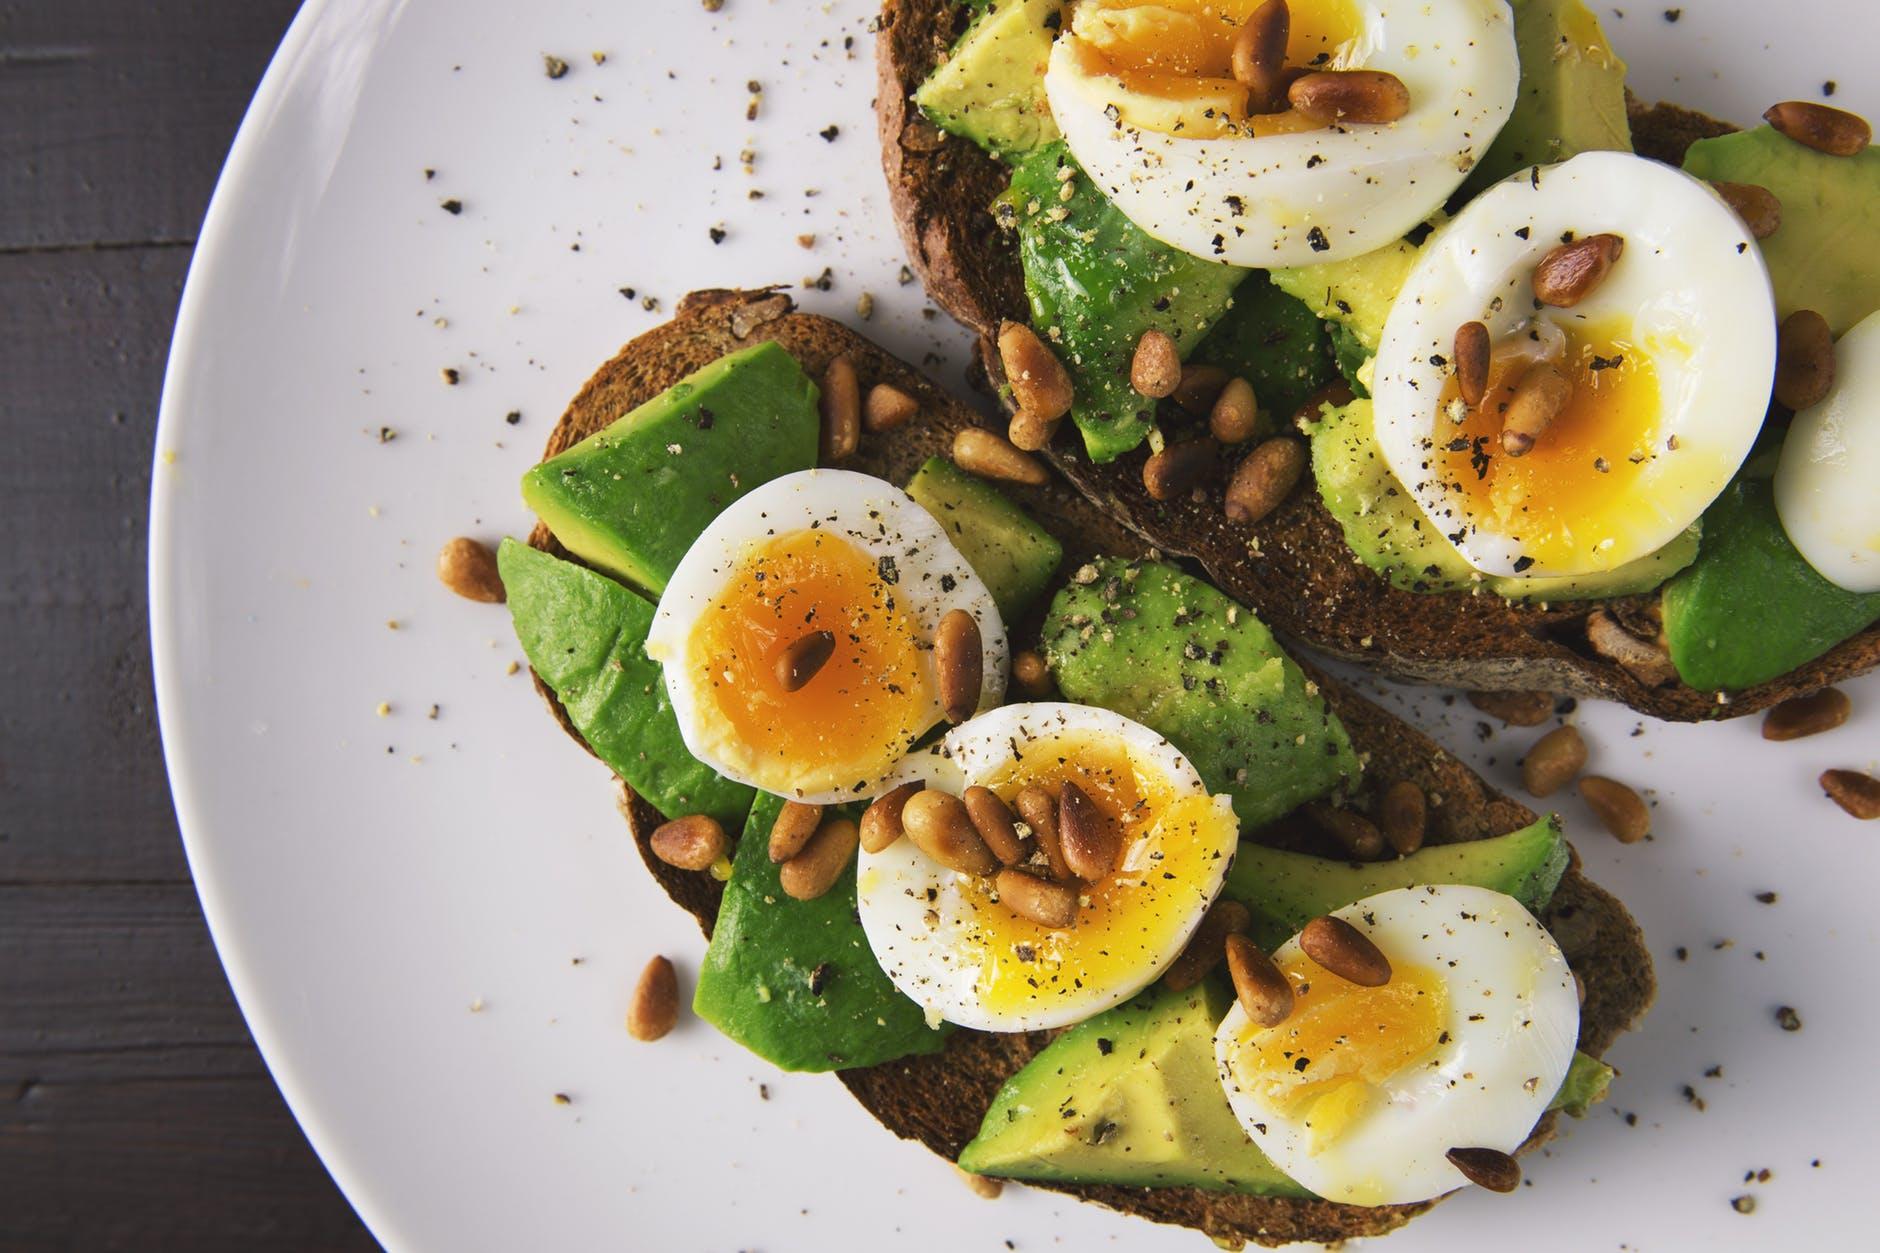 Nutrition, Avocados, Eggs